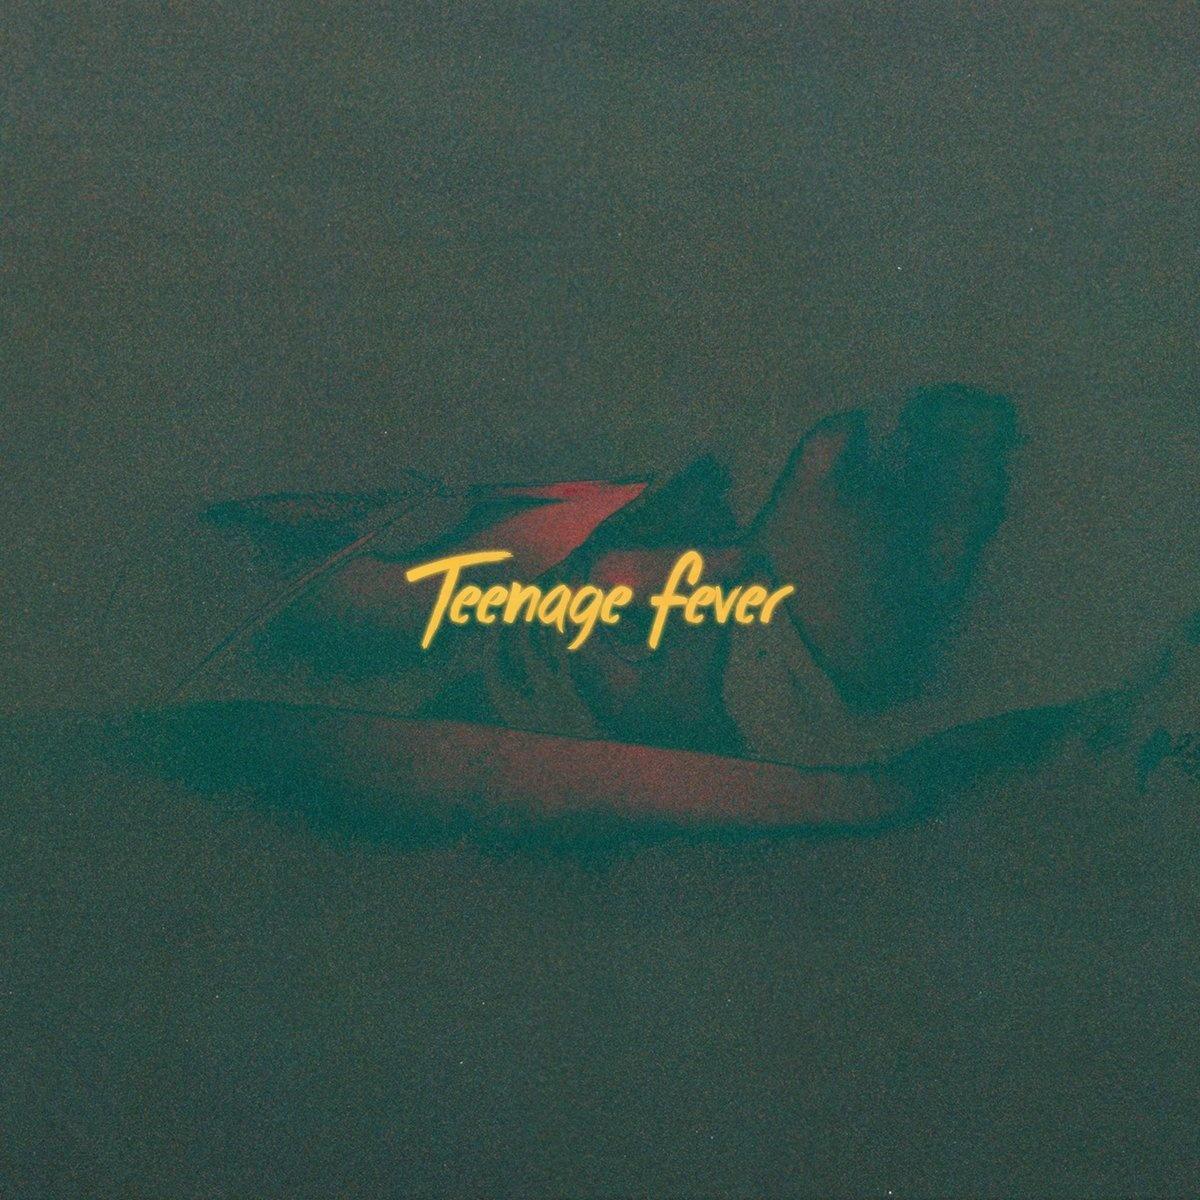 teenage fever mini kit